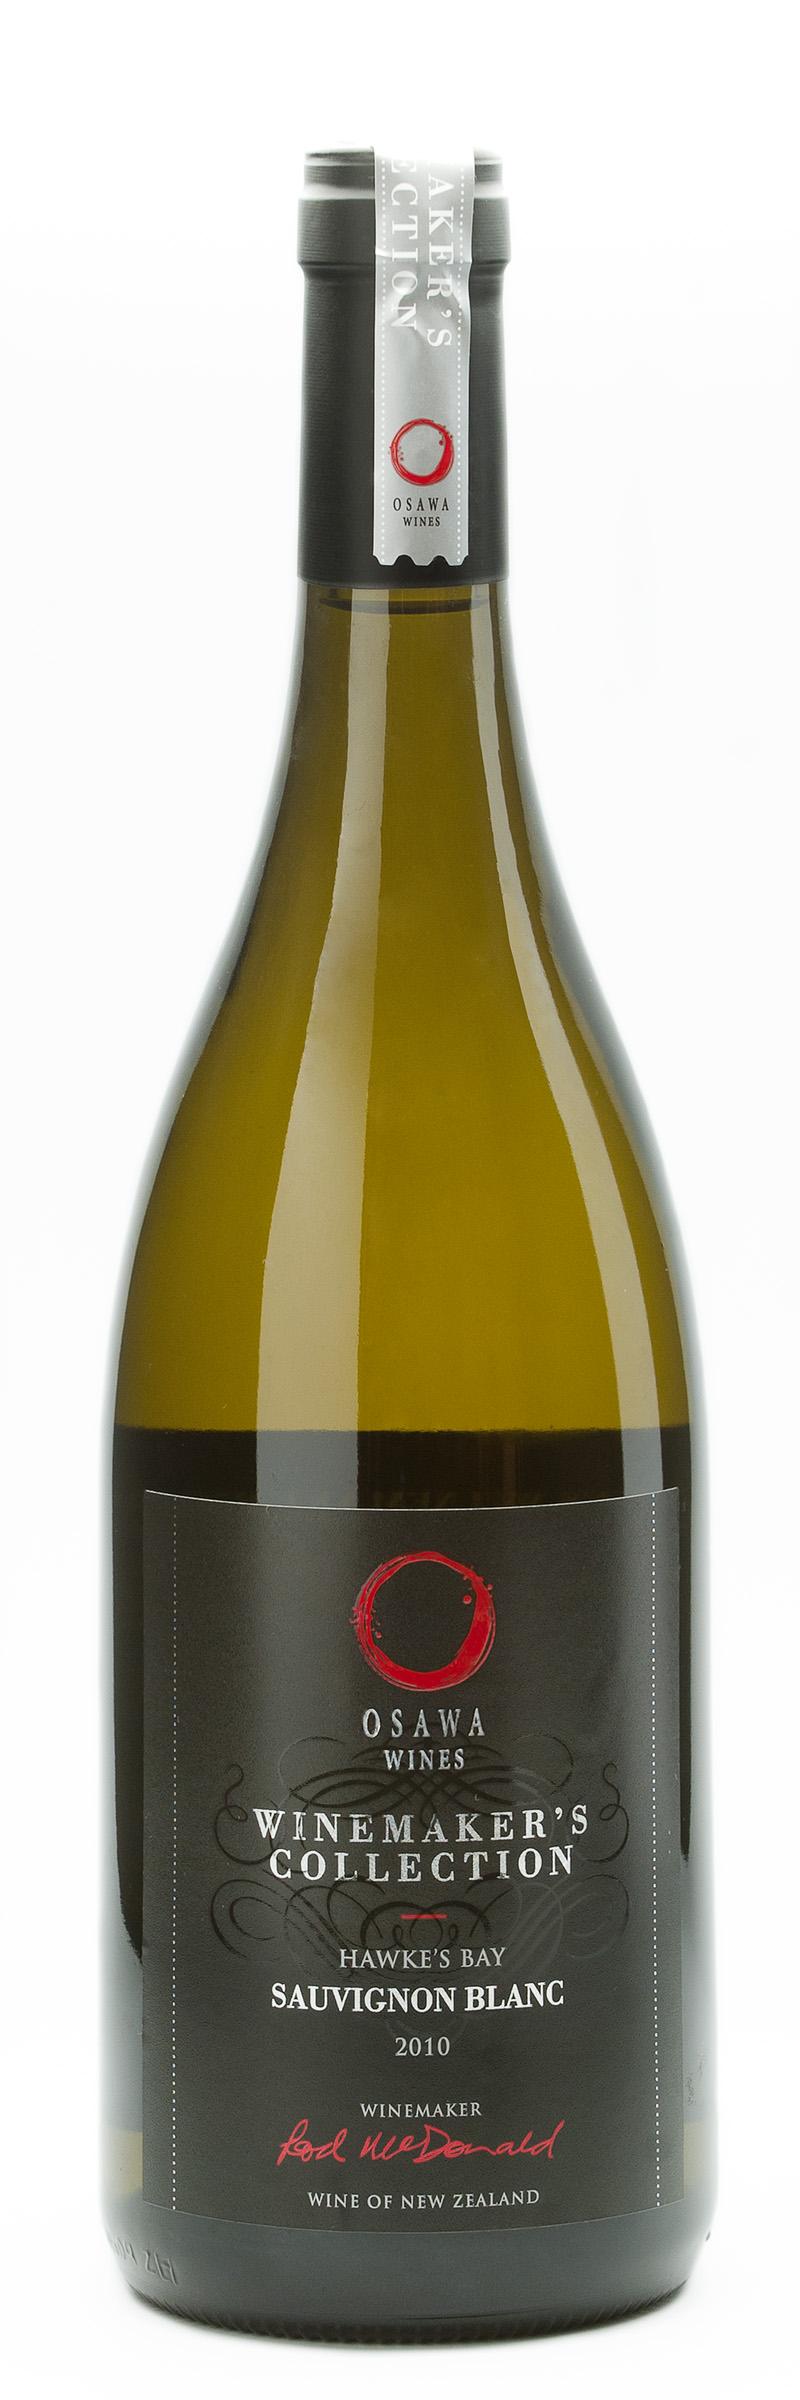 Winemaker's Collection Sauvignon Blanc